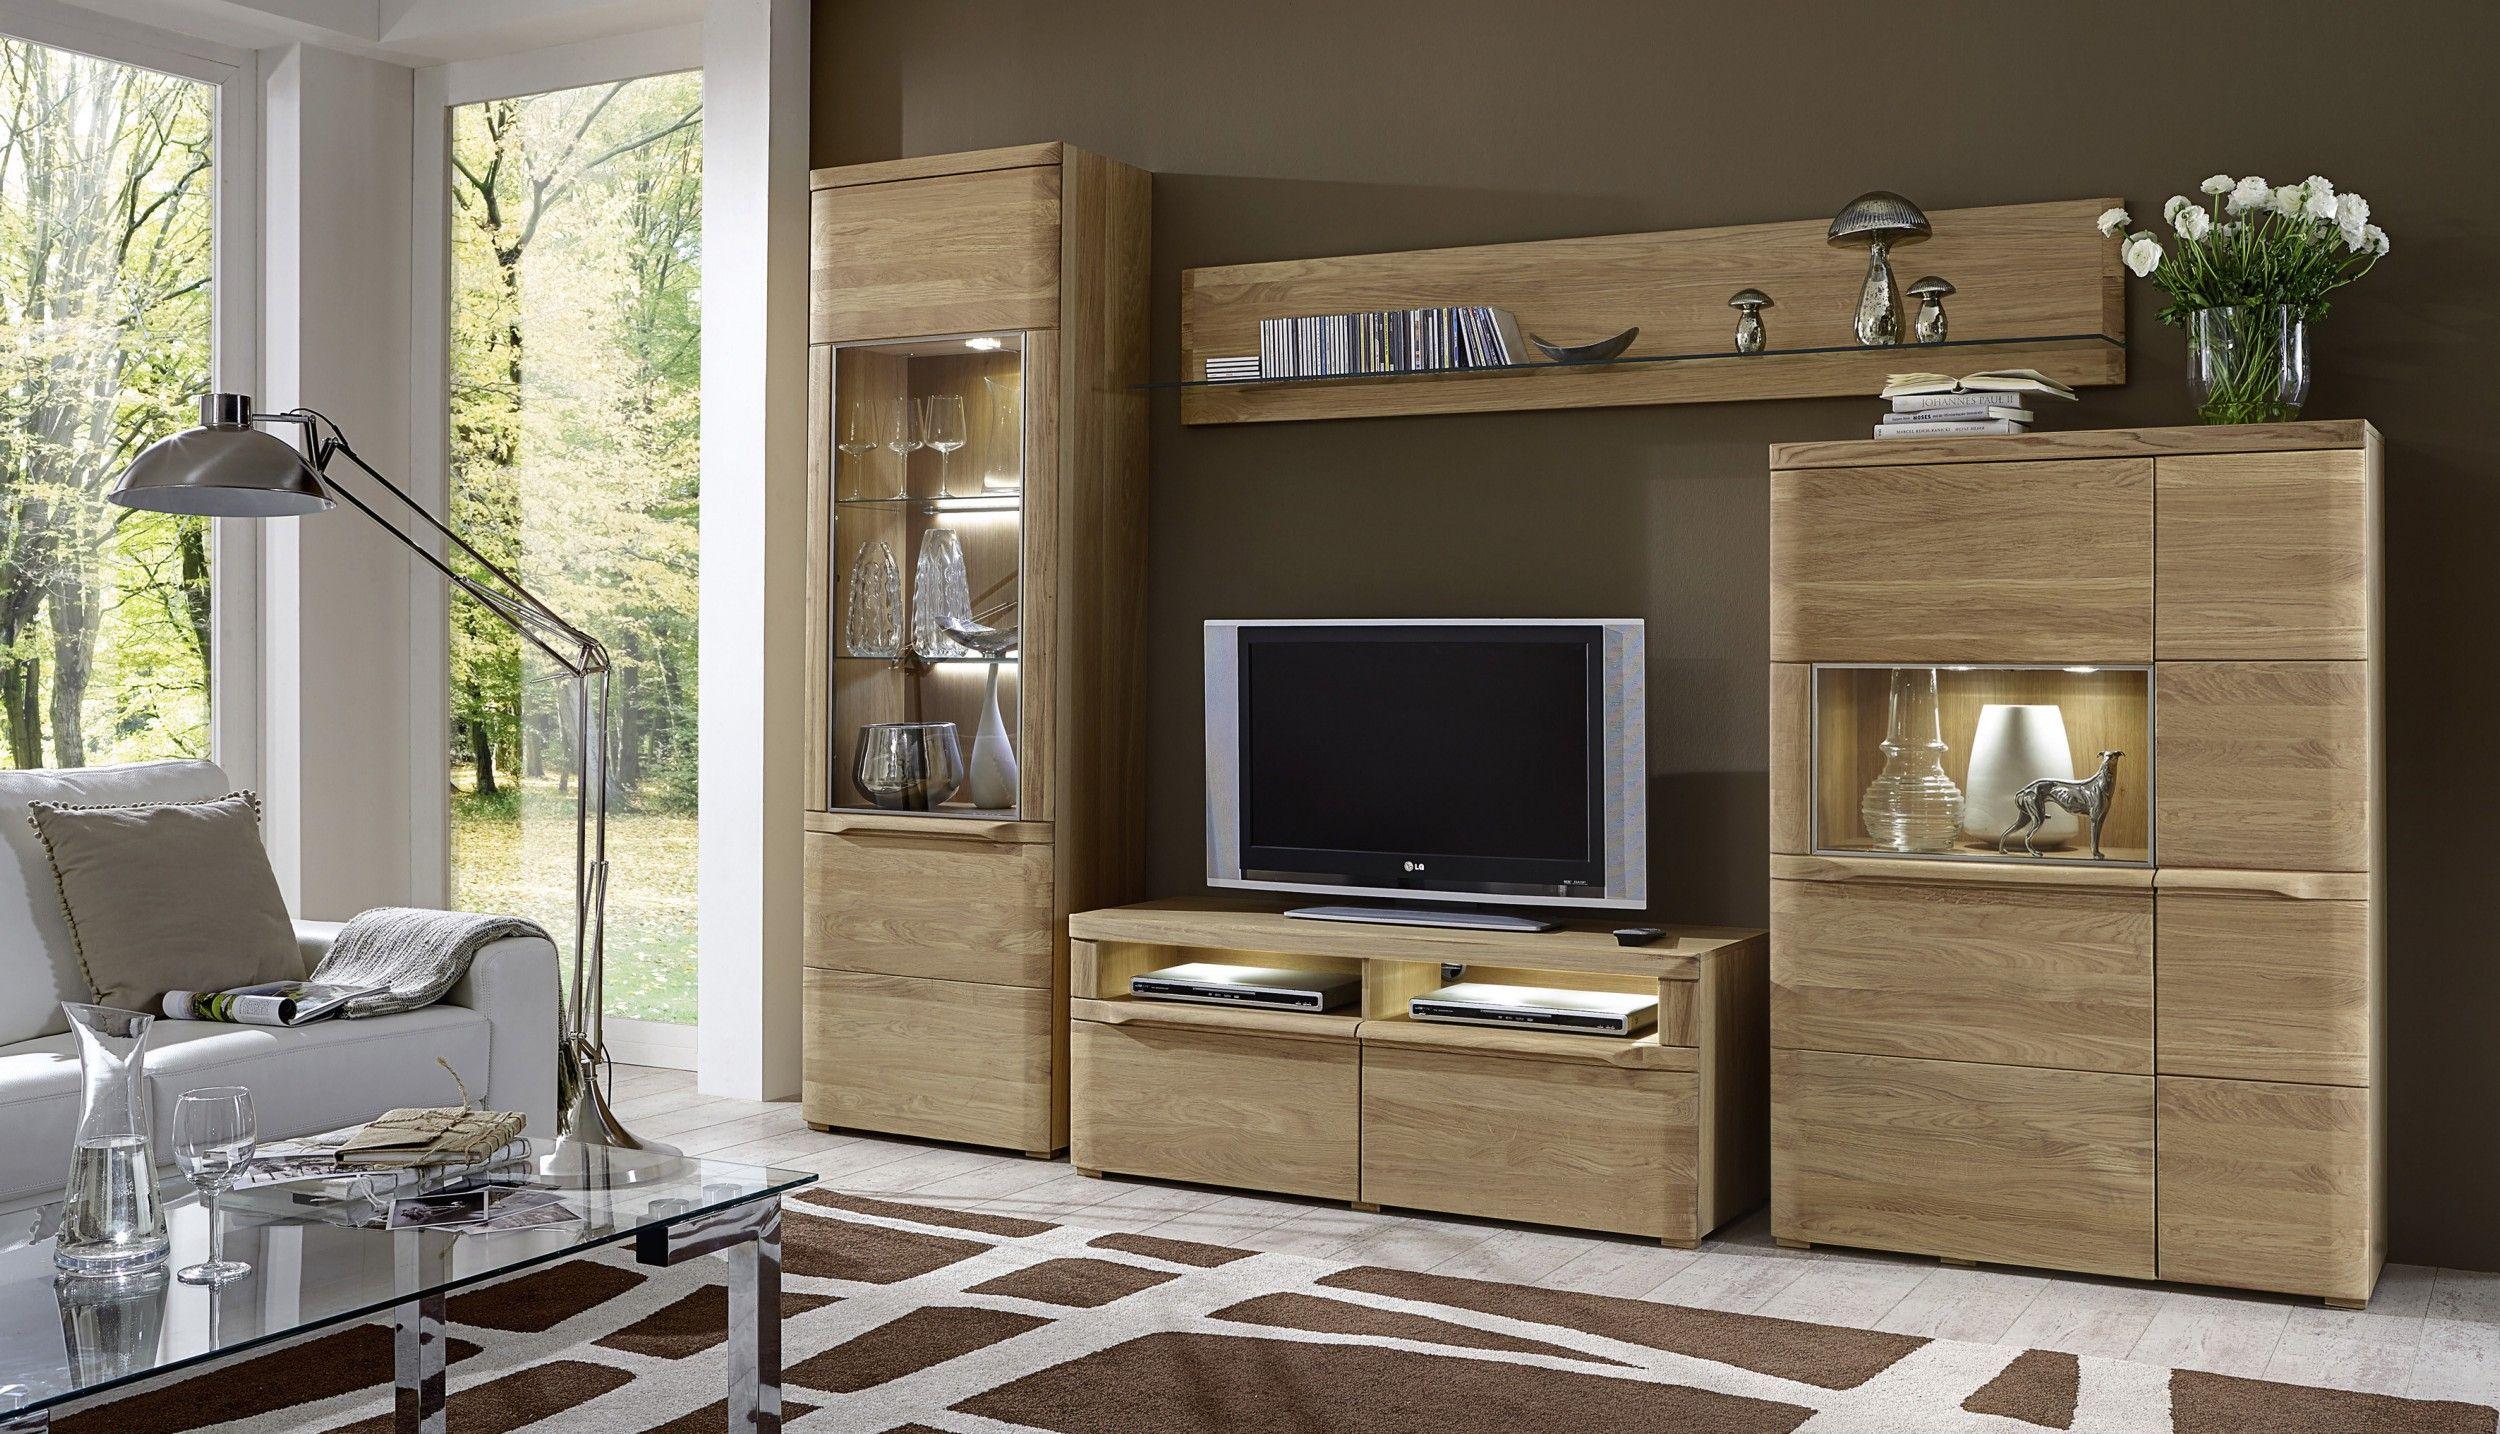 mbel eiche massiv modern latest wohnwand echtholz eiche komplett mbel pfister wei modern with. Black Bedroom Furniture Sets. Home Design Ideas